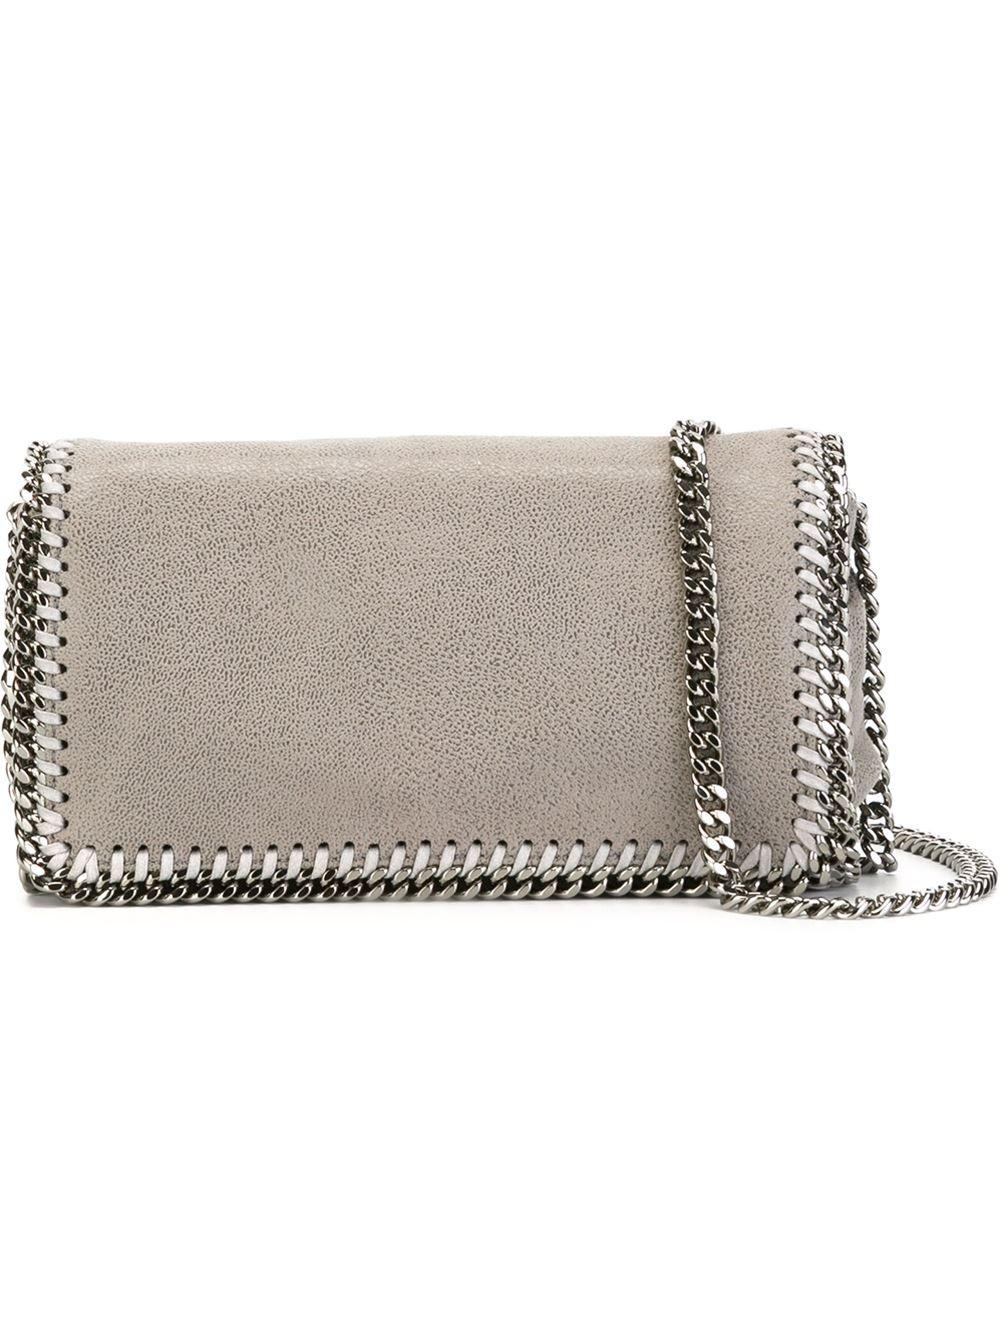 3804a0d2ba Stella McCartney. Women s Falabella Cross-body Bag